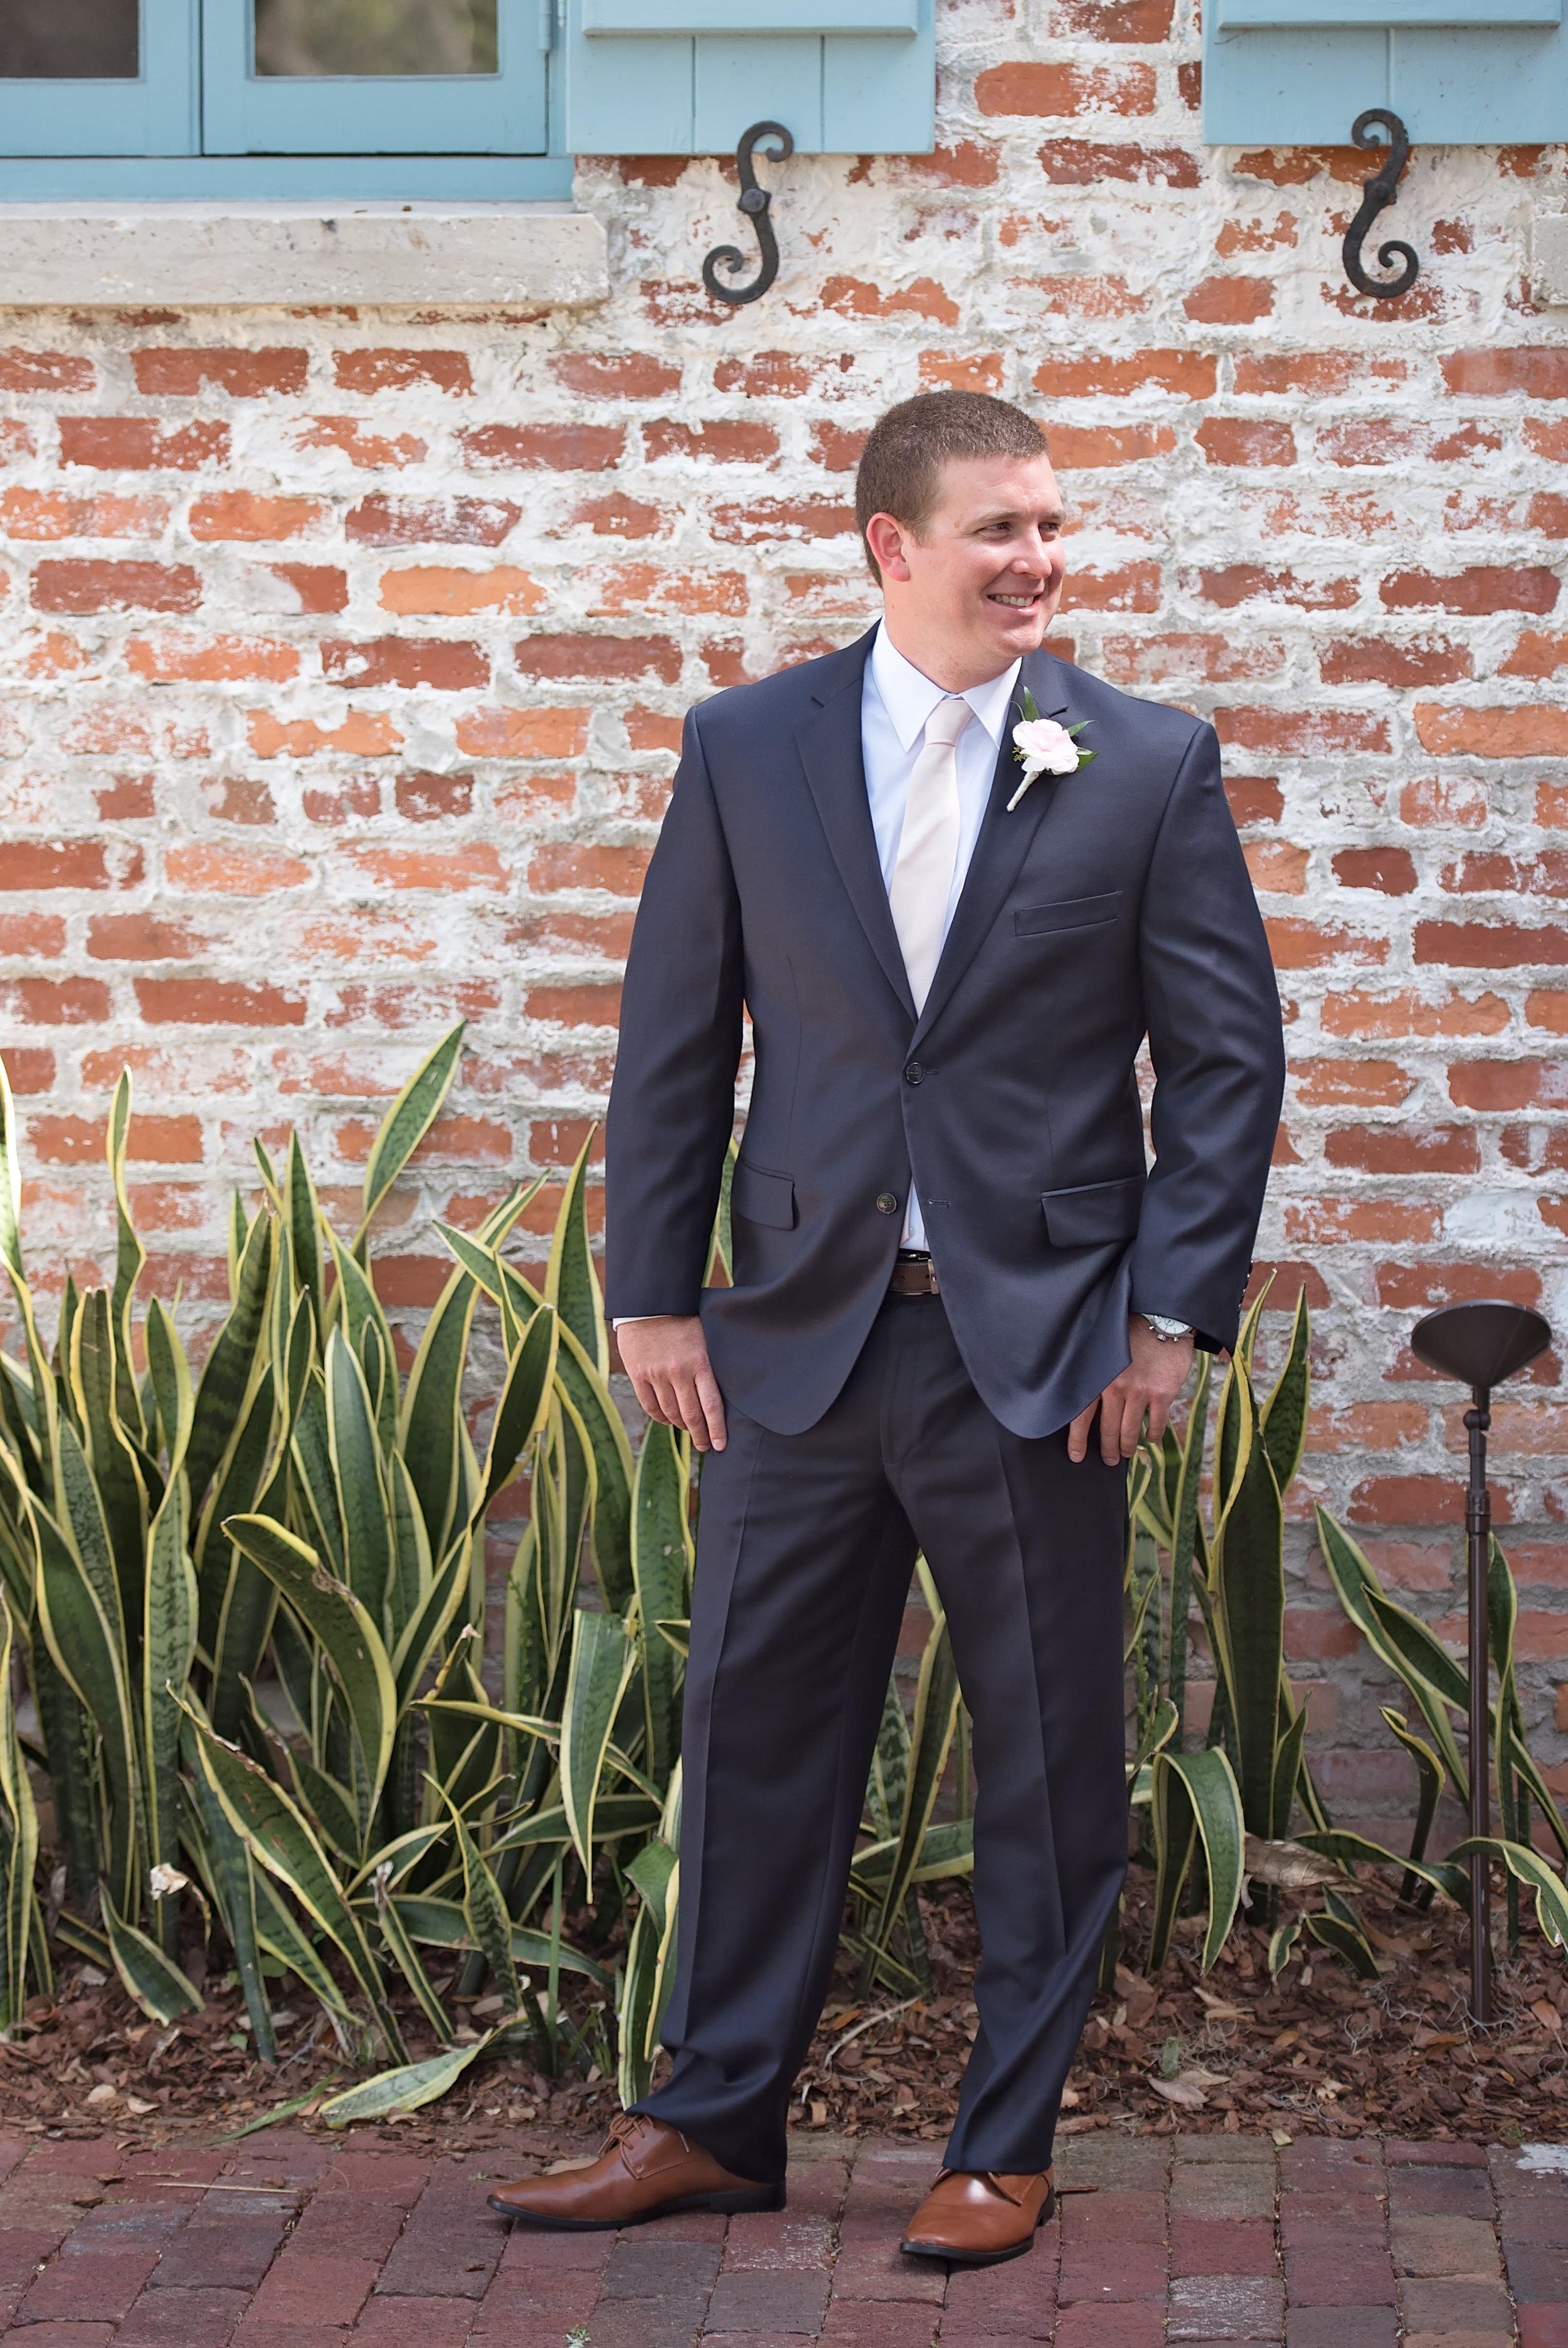 Groom Suits - Blush and White Wedding - Los Feliz Wedding